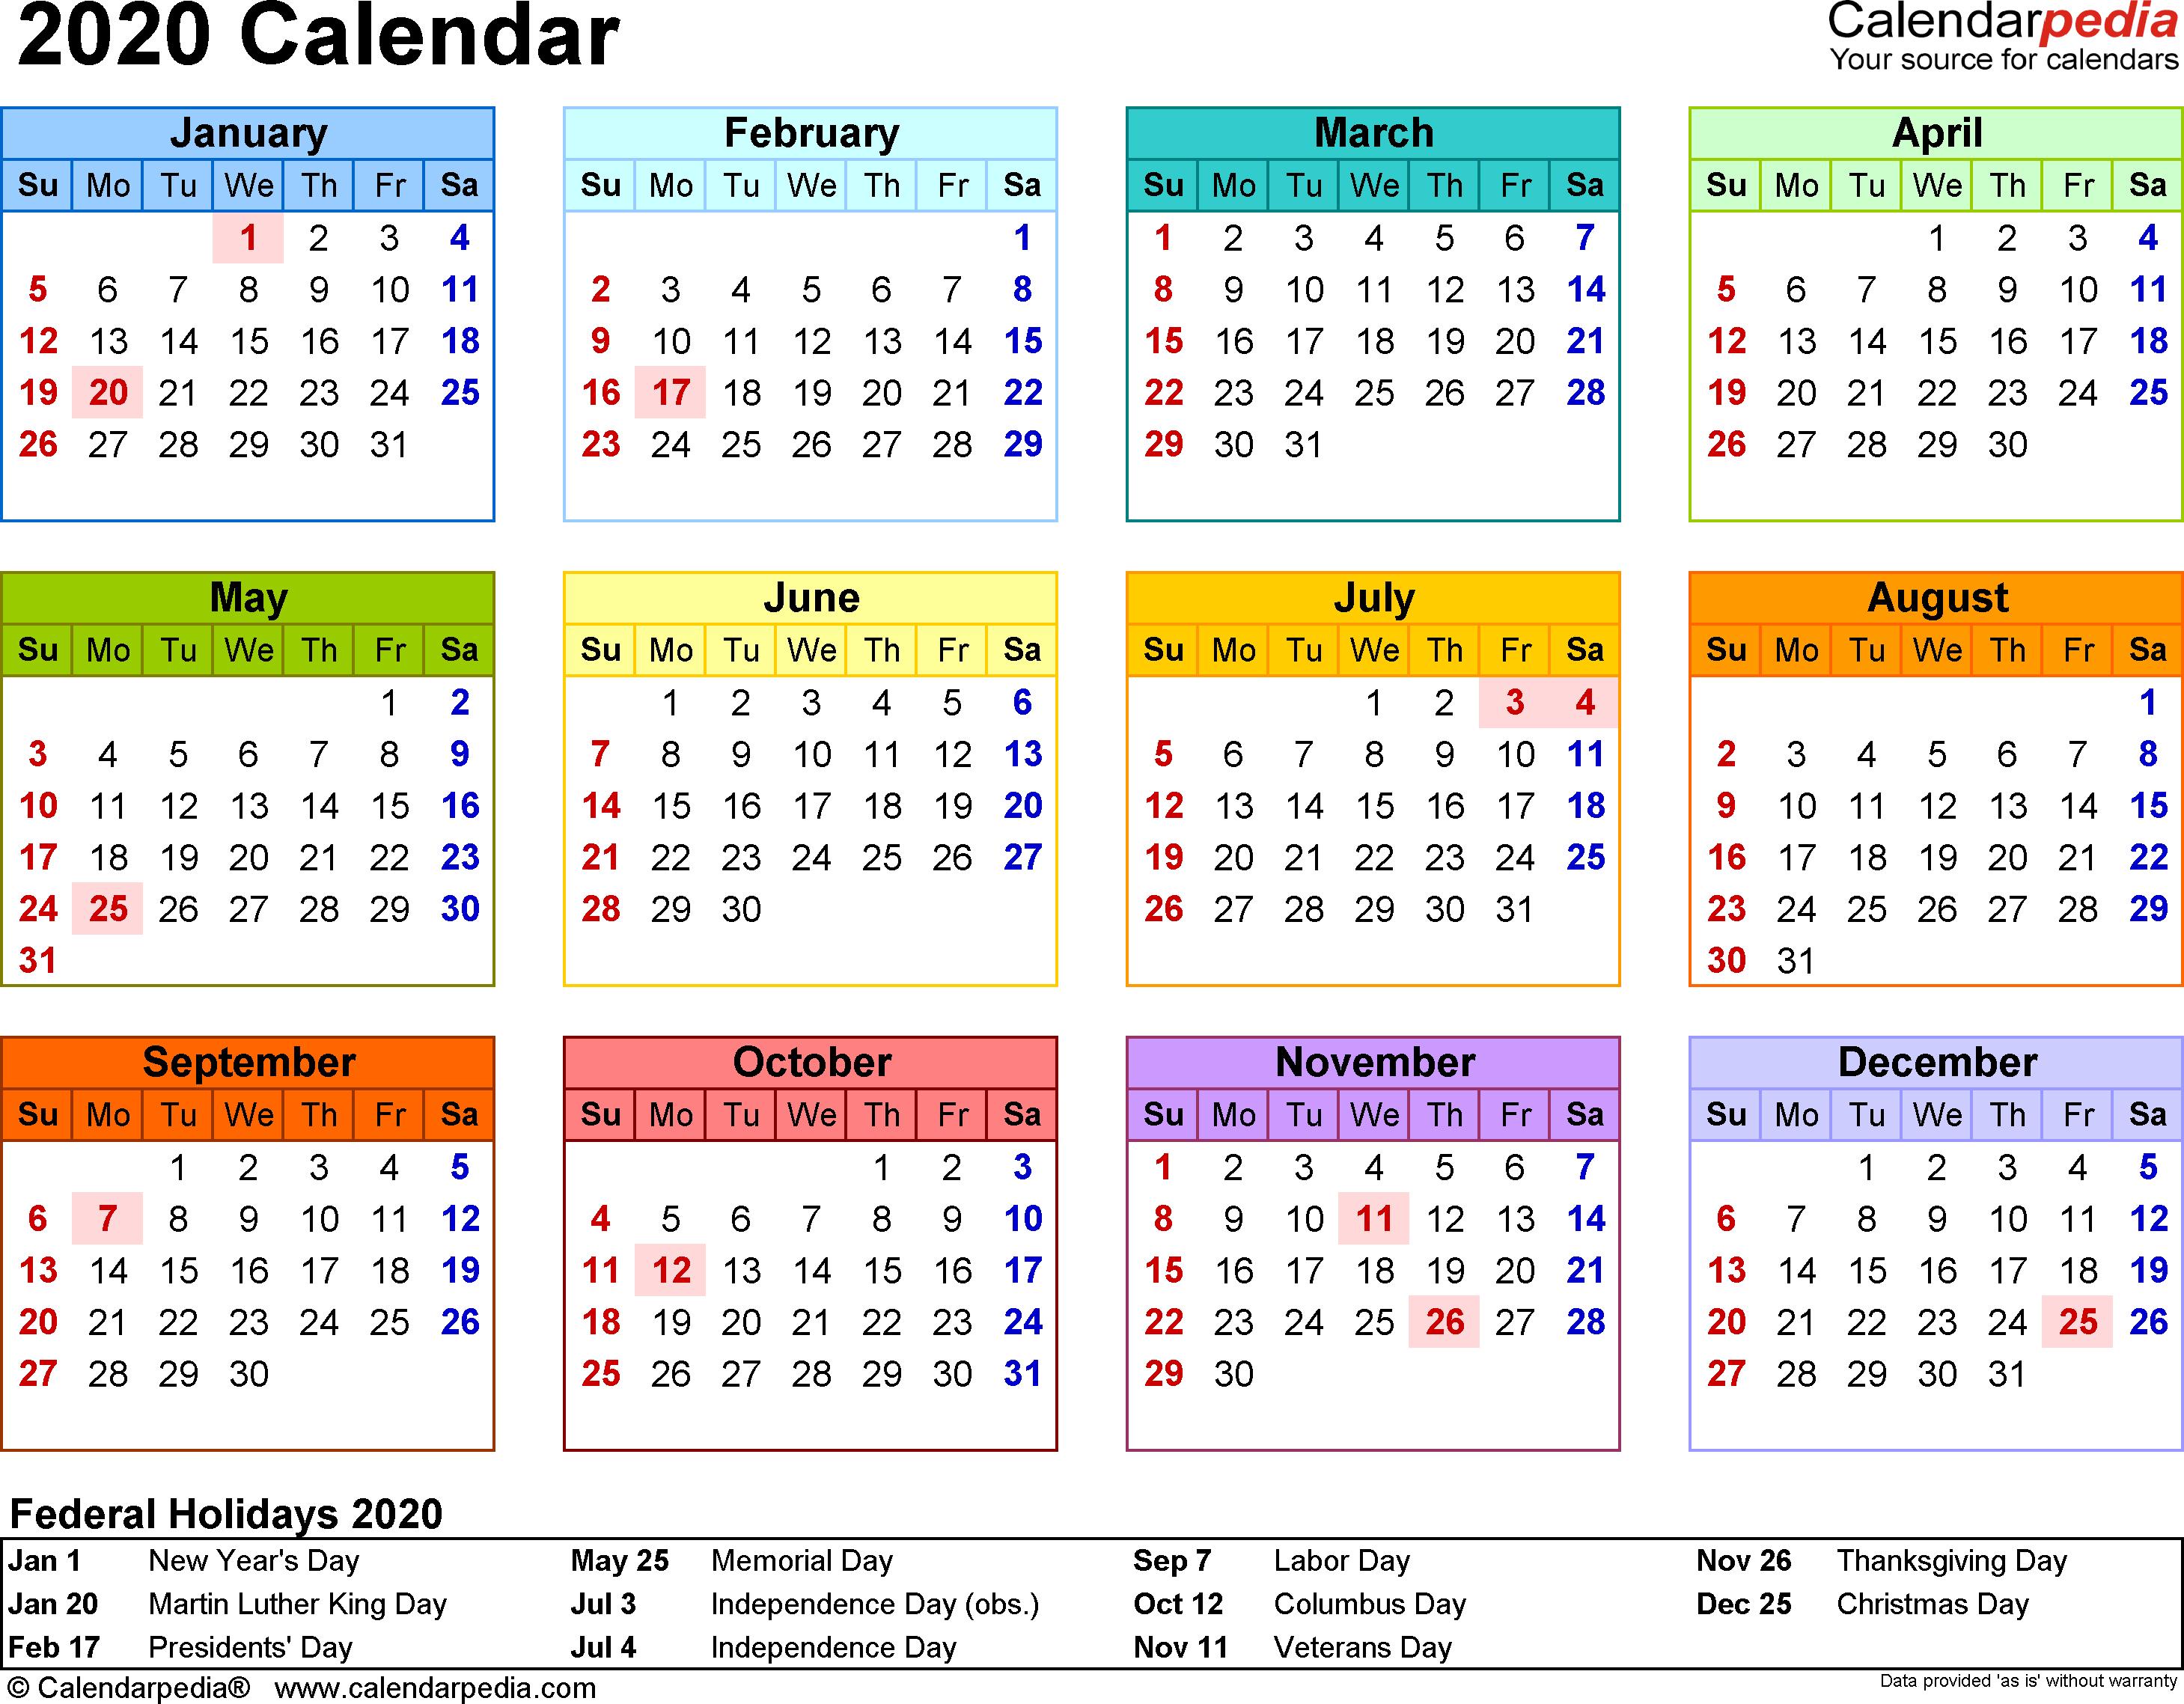 2020 Calendar - Download 17 Free Printable Excel Templates (.xlsx)